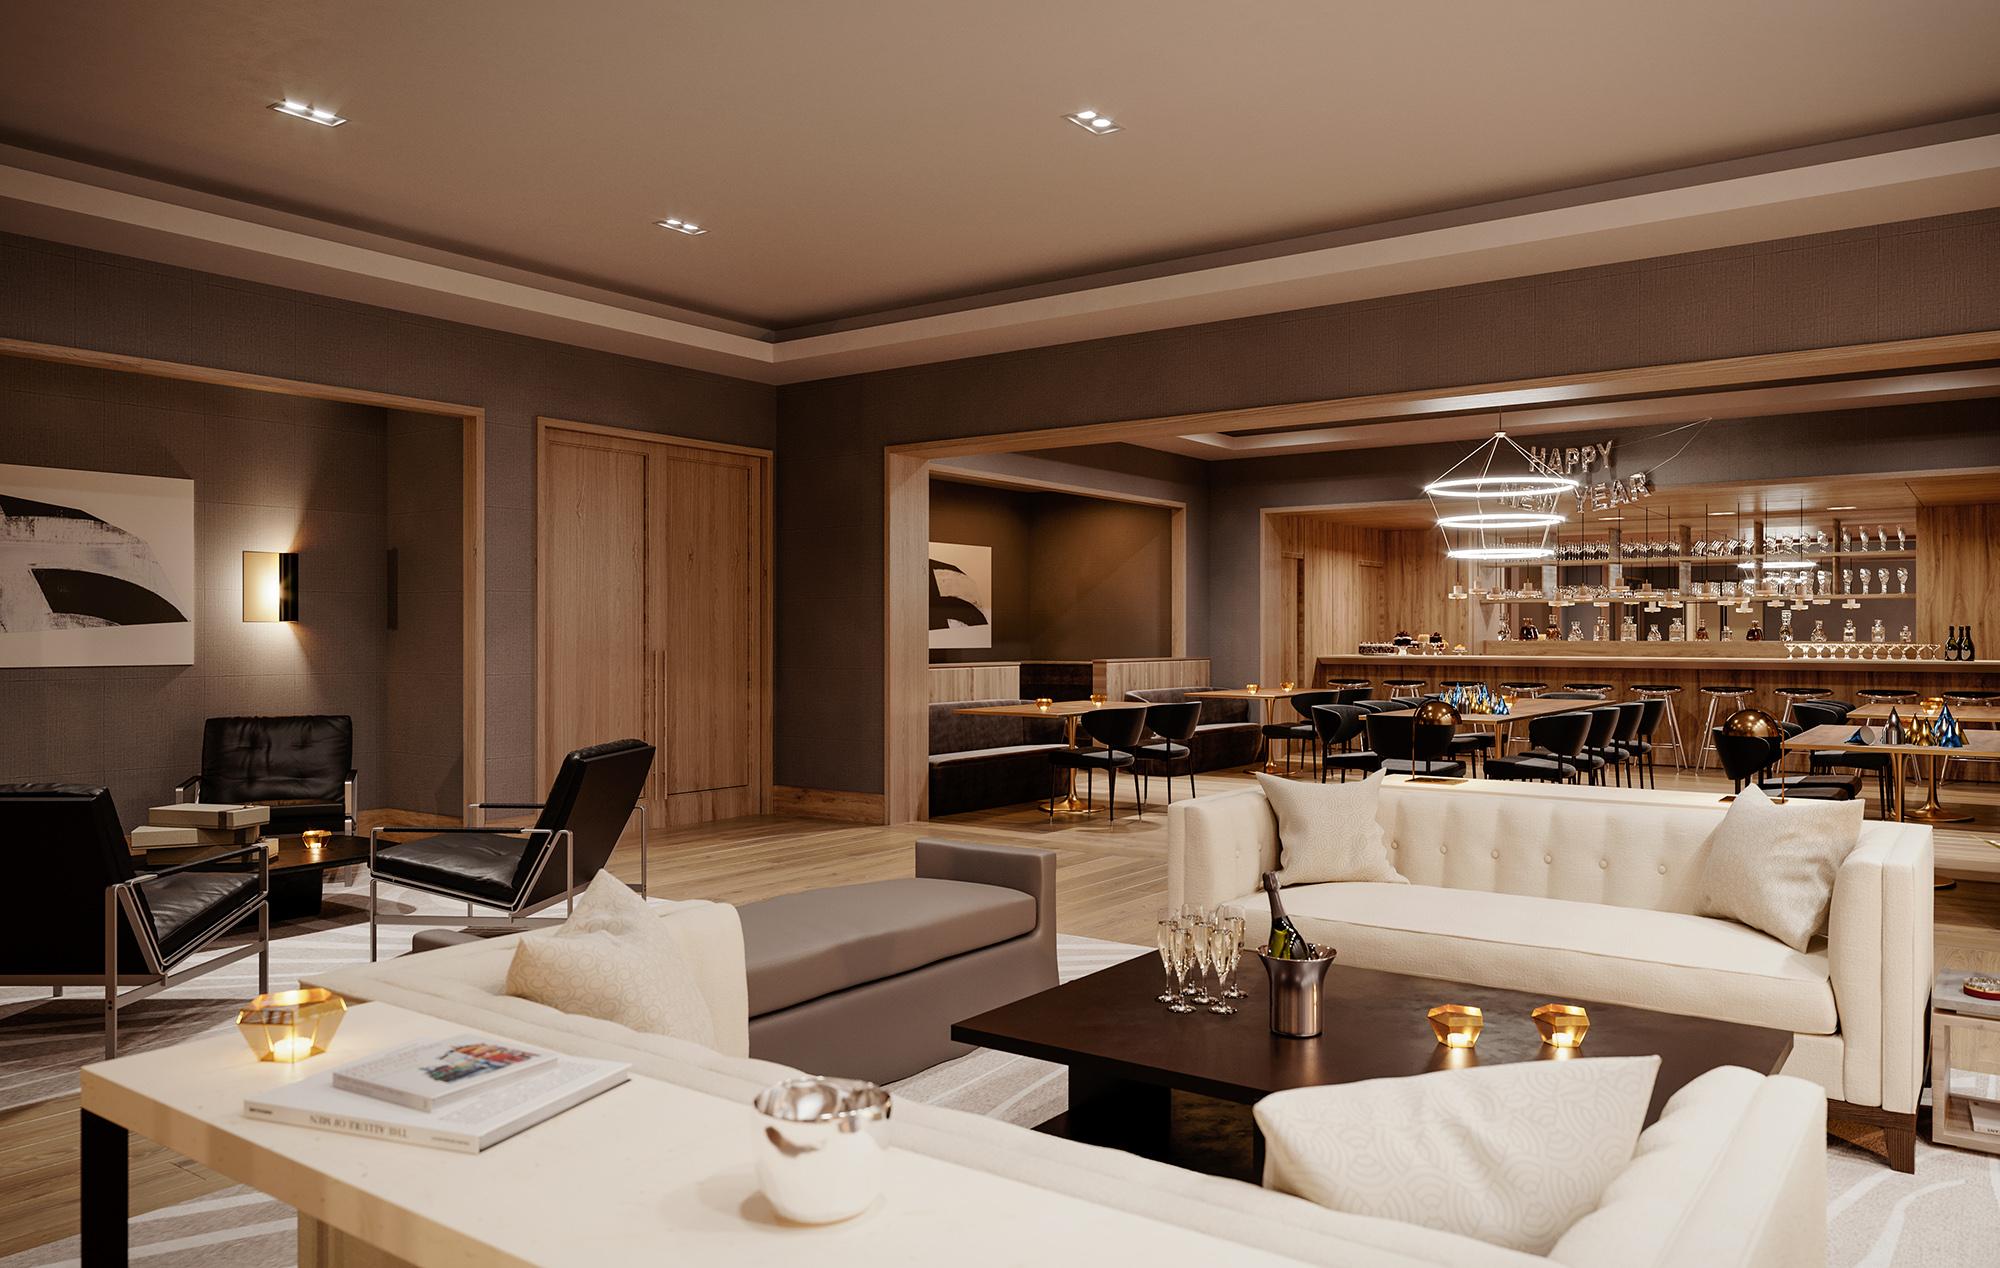 Luxury Upper Westside Community Room and Bar